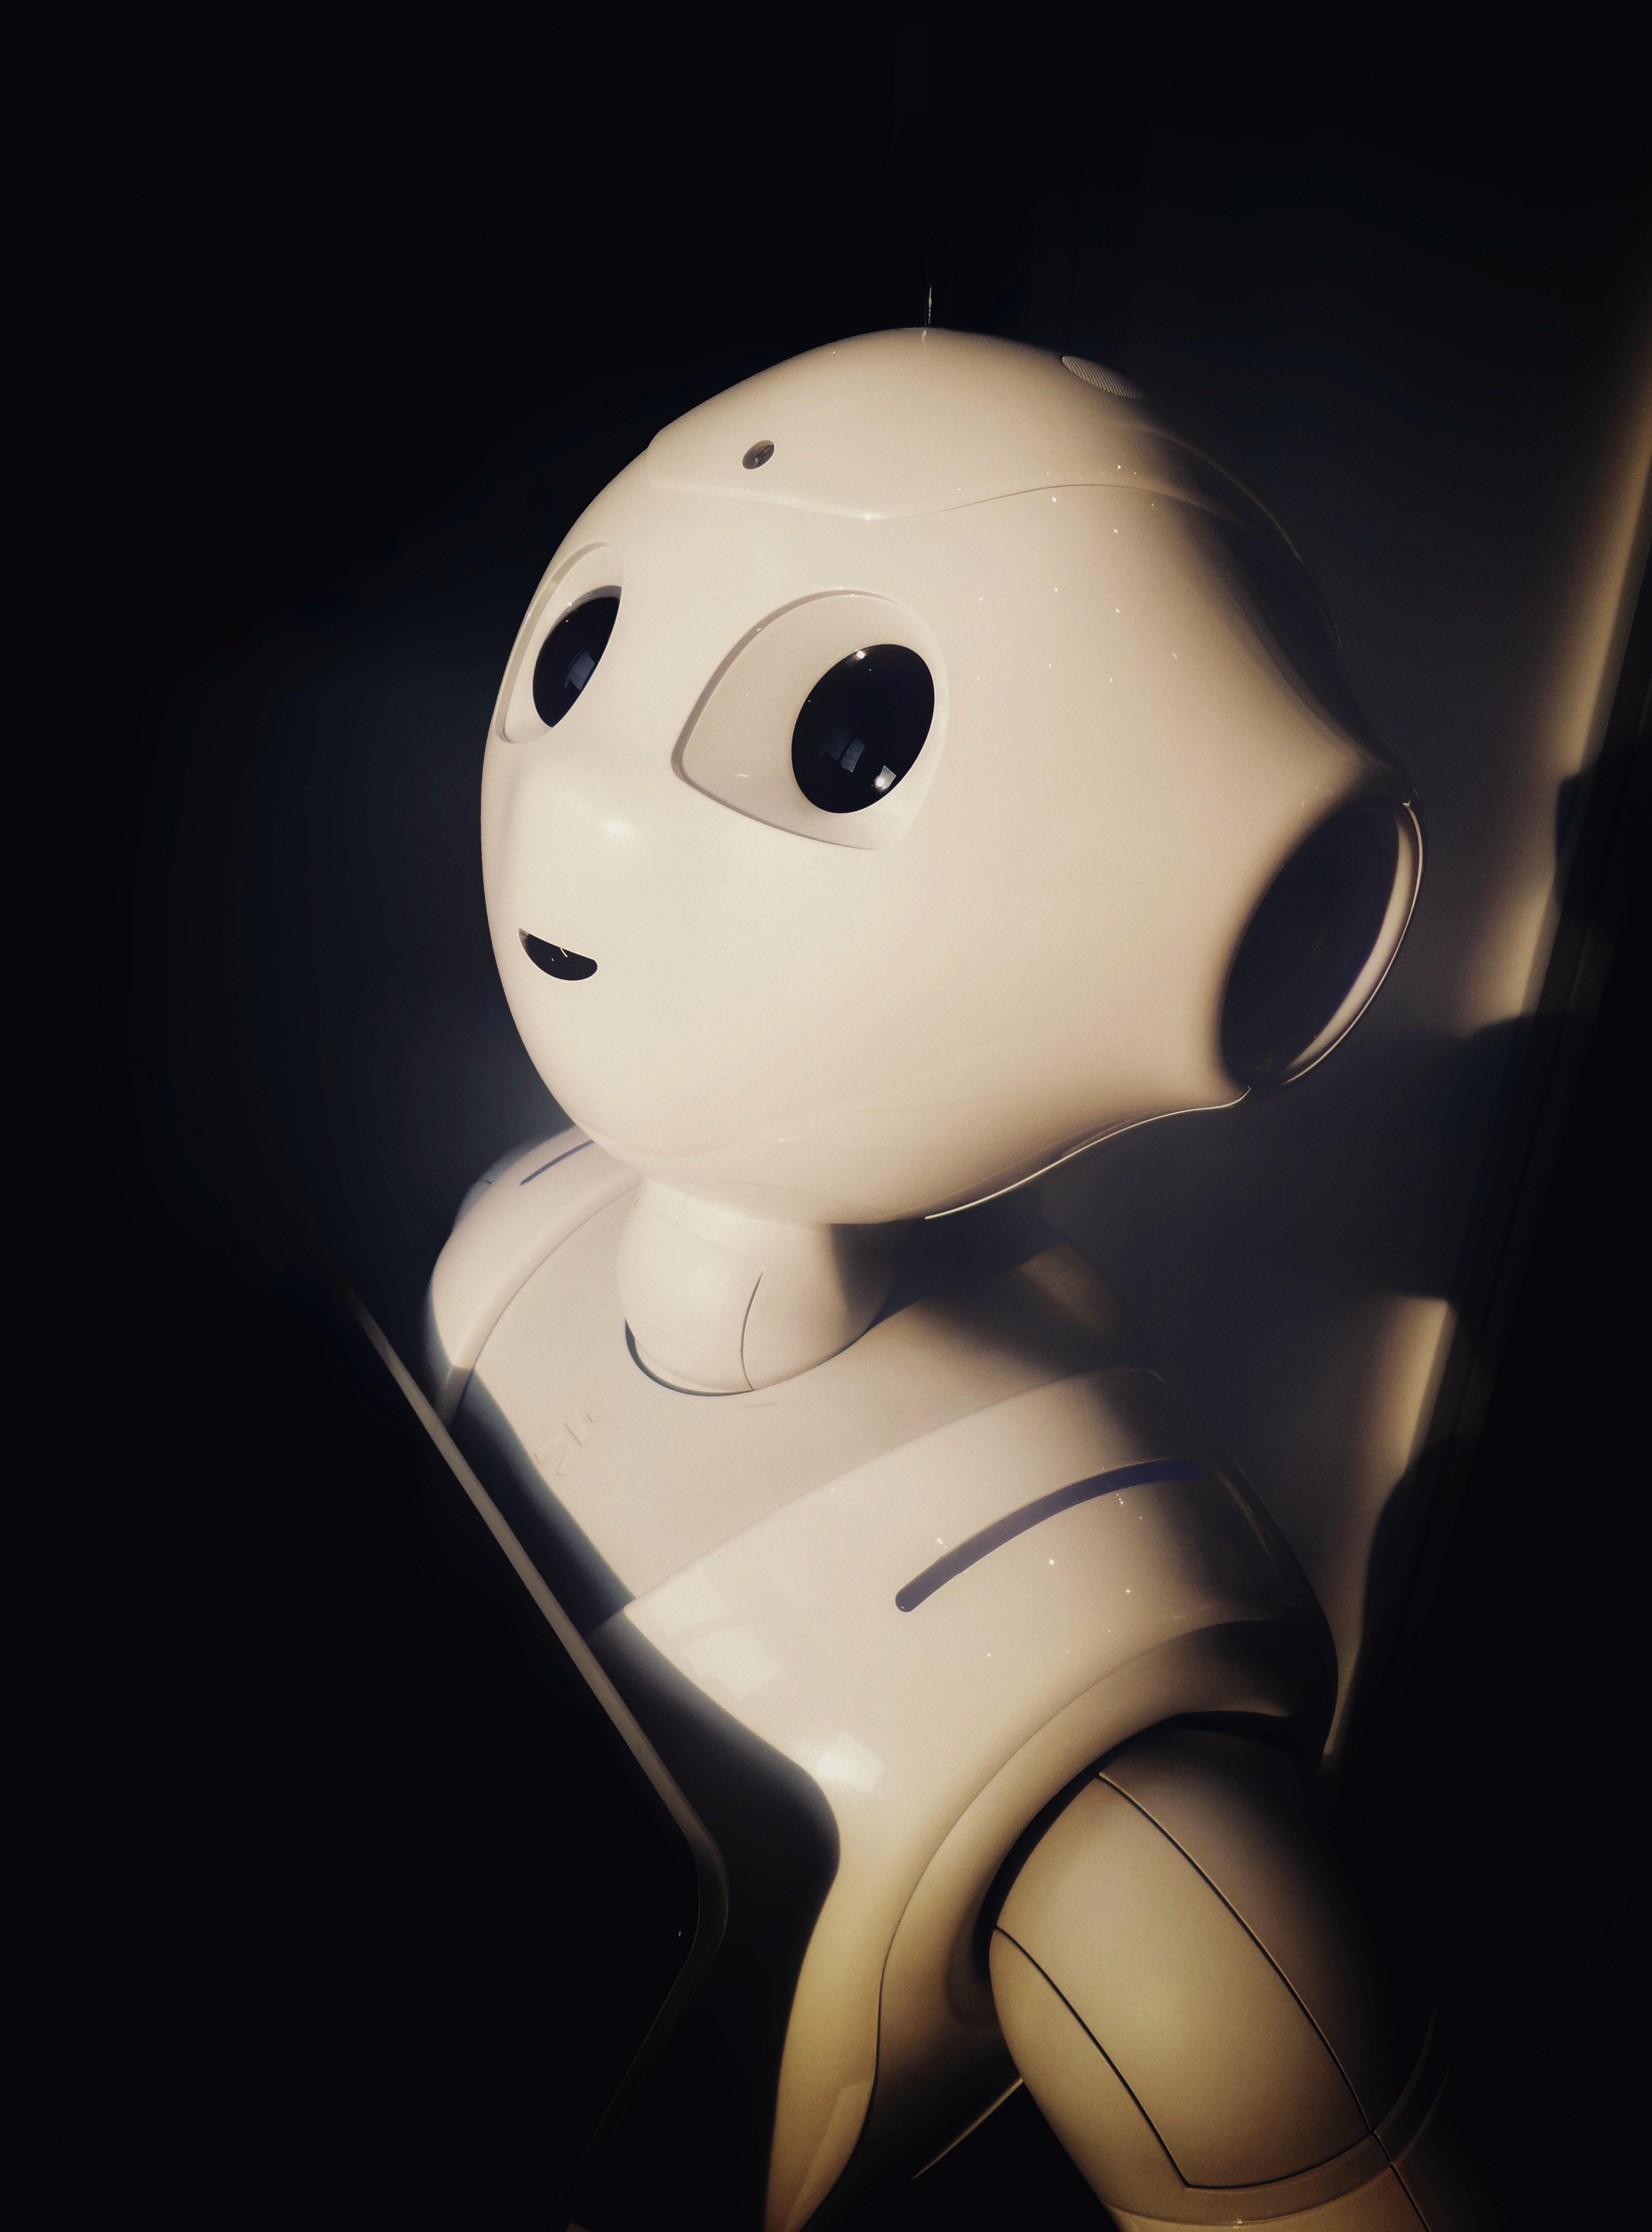 human robot toy near wall